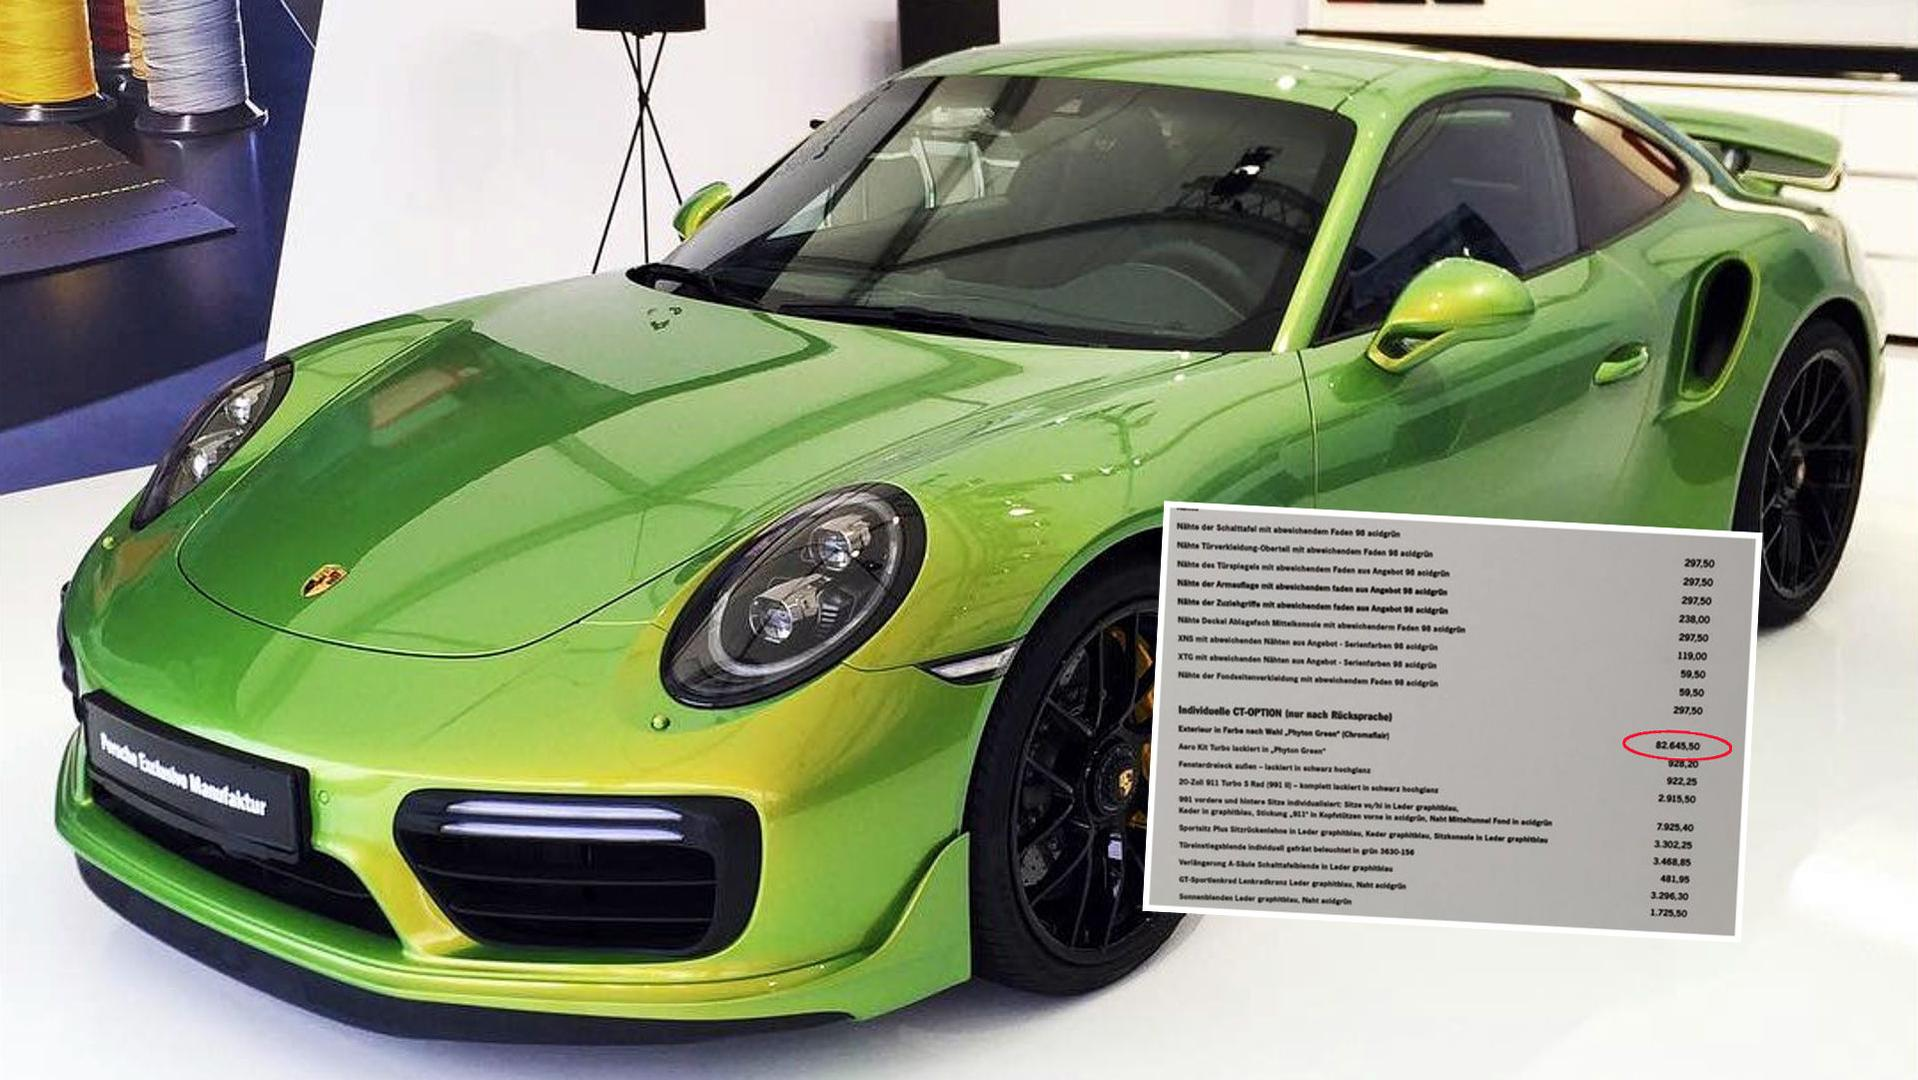 Car Paint Job Cost >> Porsche 911 Turbo S' Custom Factory Paint Job Costs Almost ...